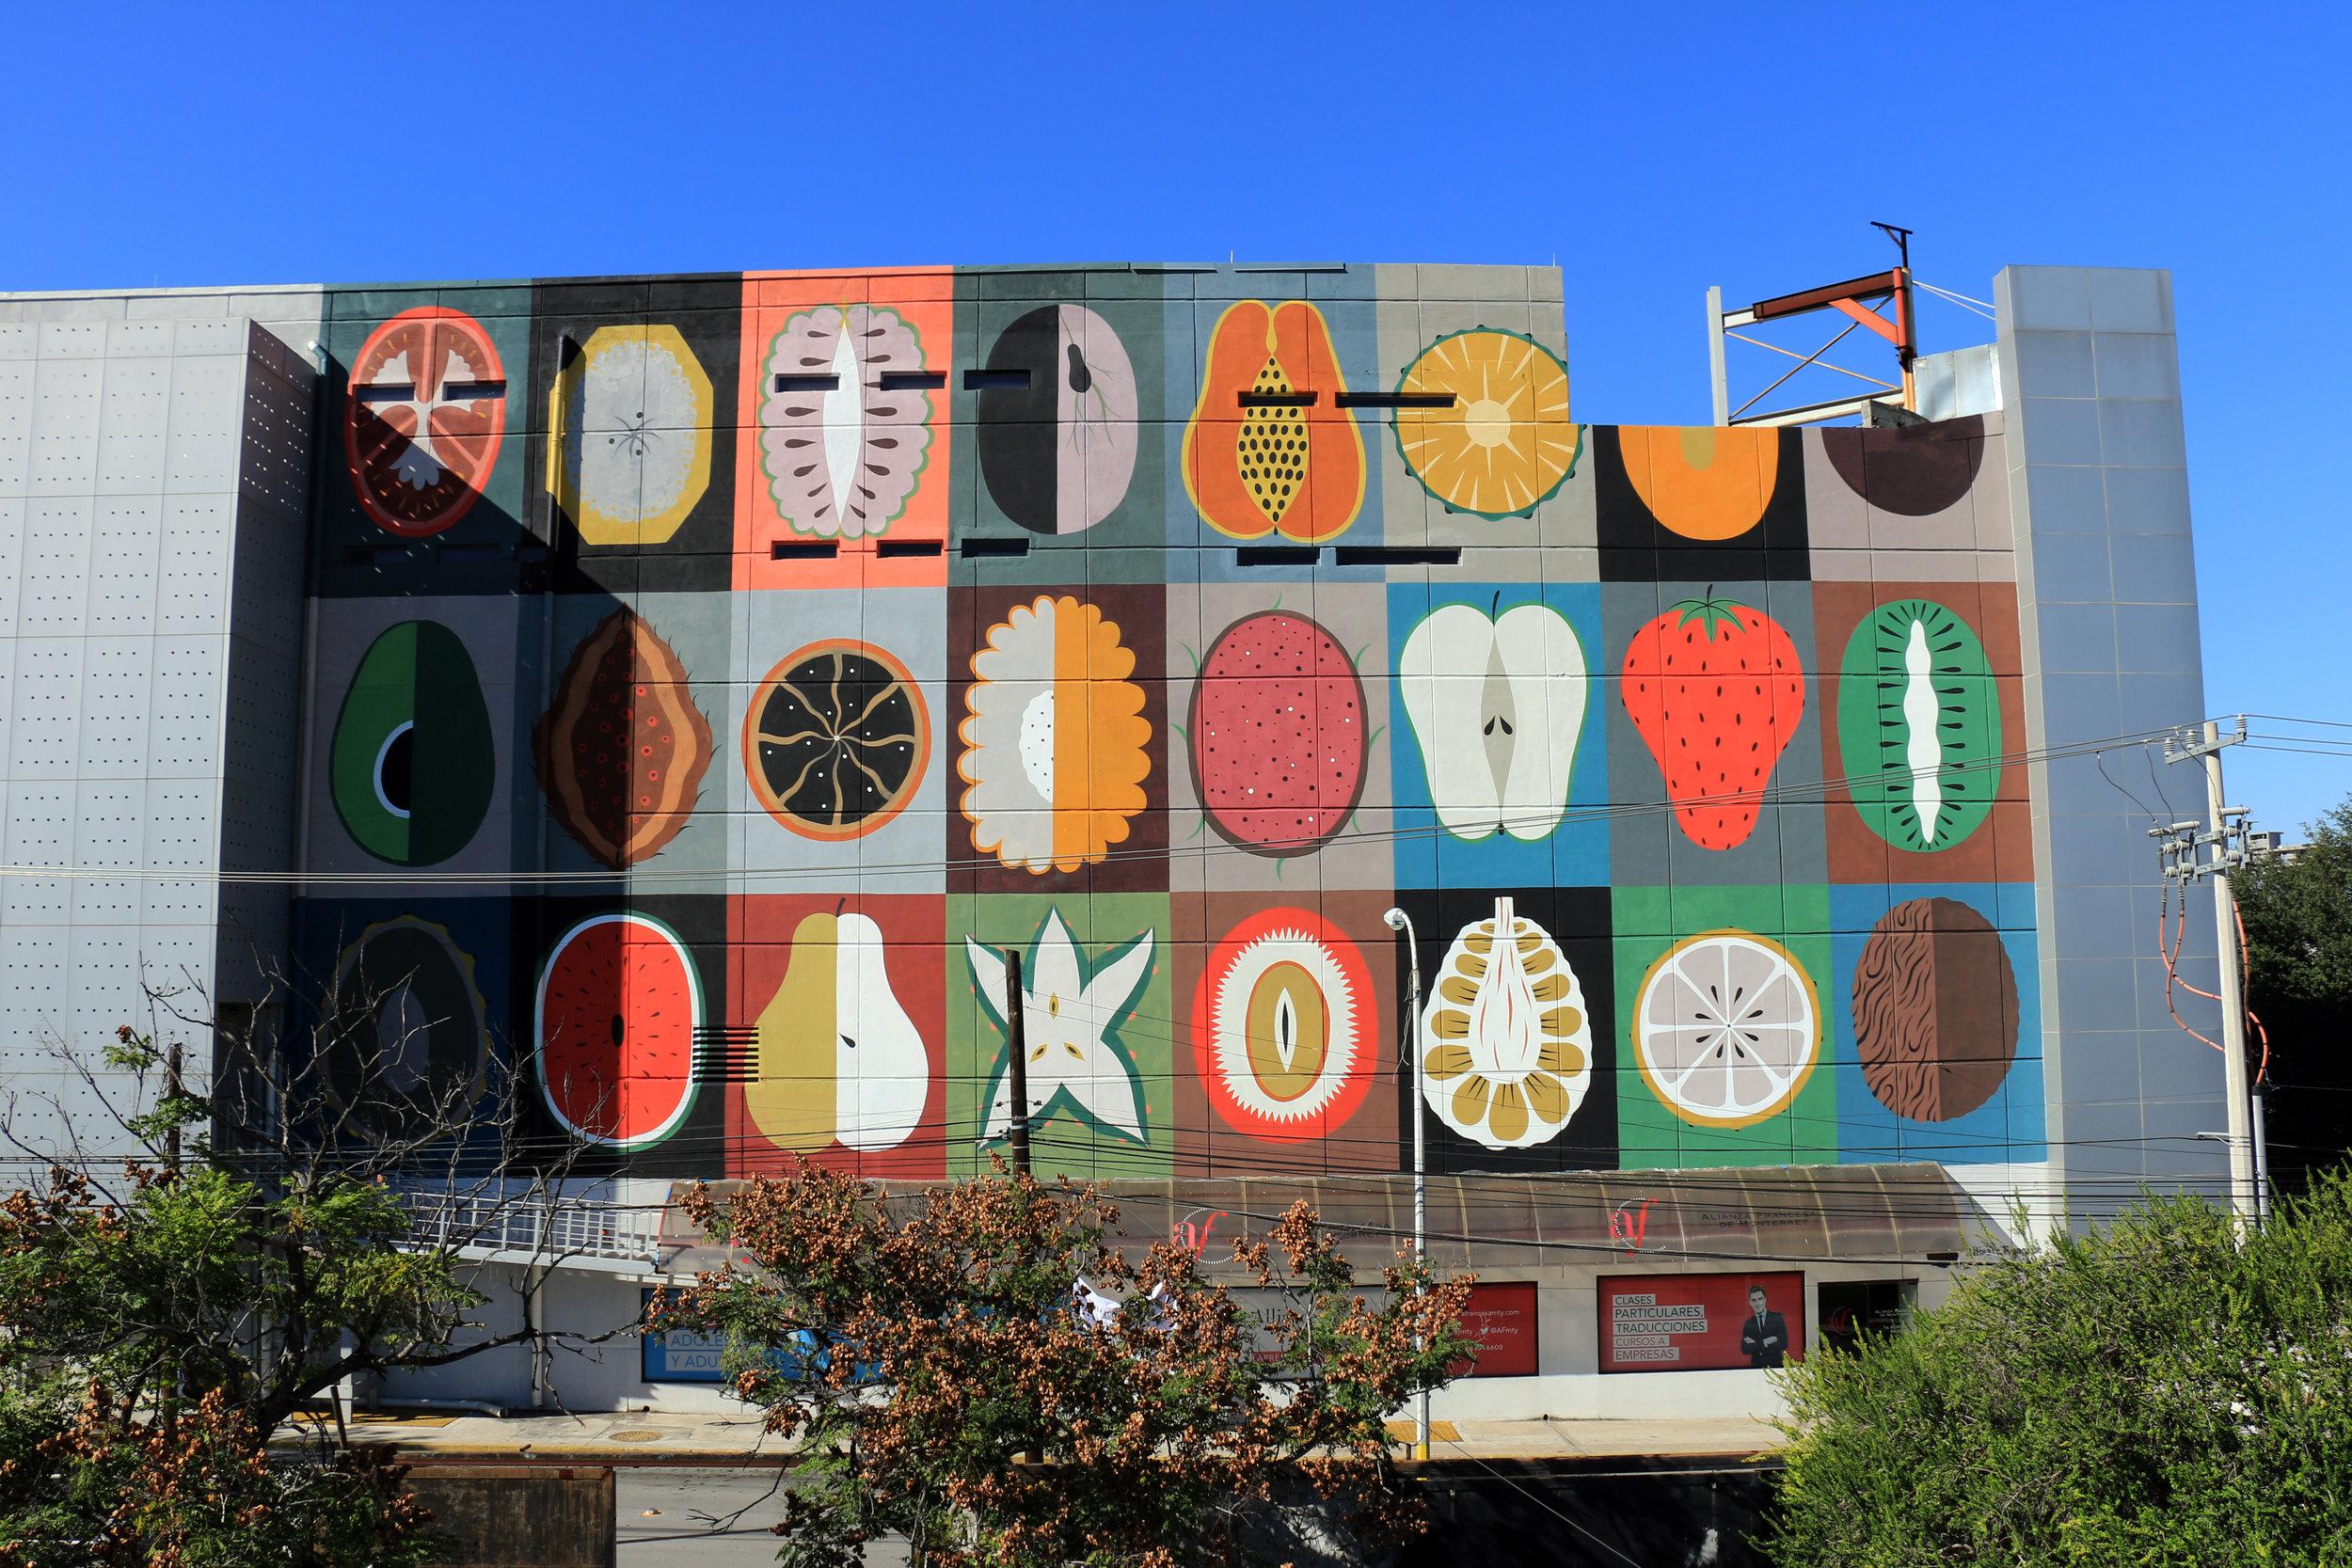 Agostino Iacurci colorful mural art